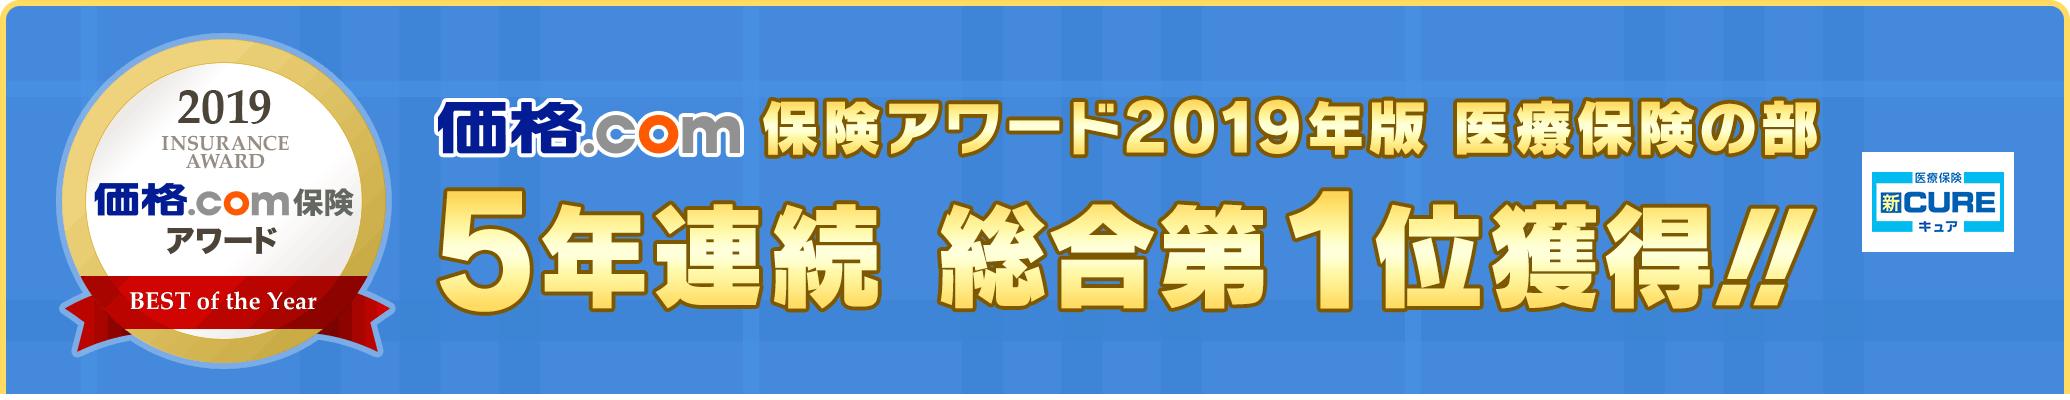 価格.com保険アワード2019年版 医療保険の部5年連続 総合第1位獲得!!